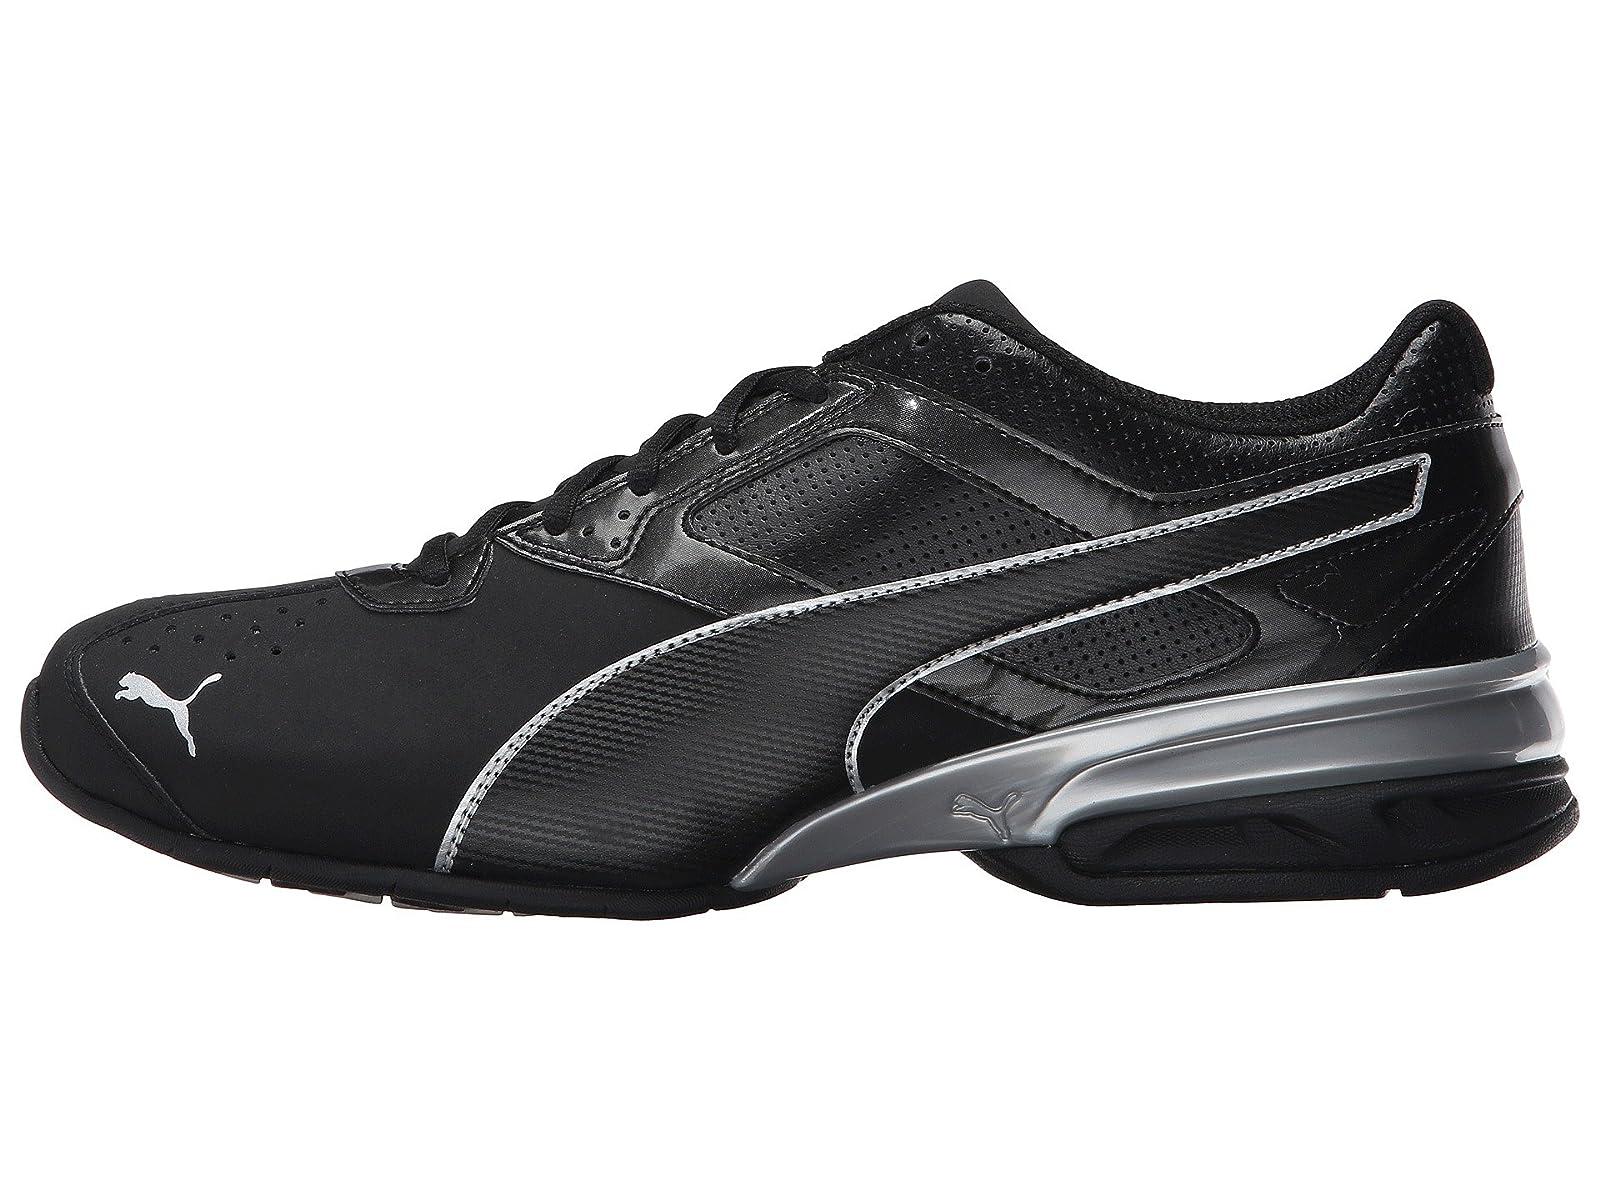 Men-039-s-Scarpe-Da-Ginnastica-amp-Athletic-Shoes-Puma-Tazon-6-FM miniatura 5